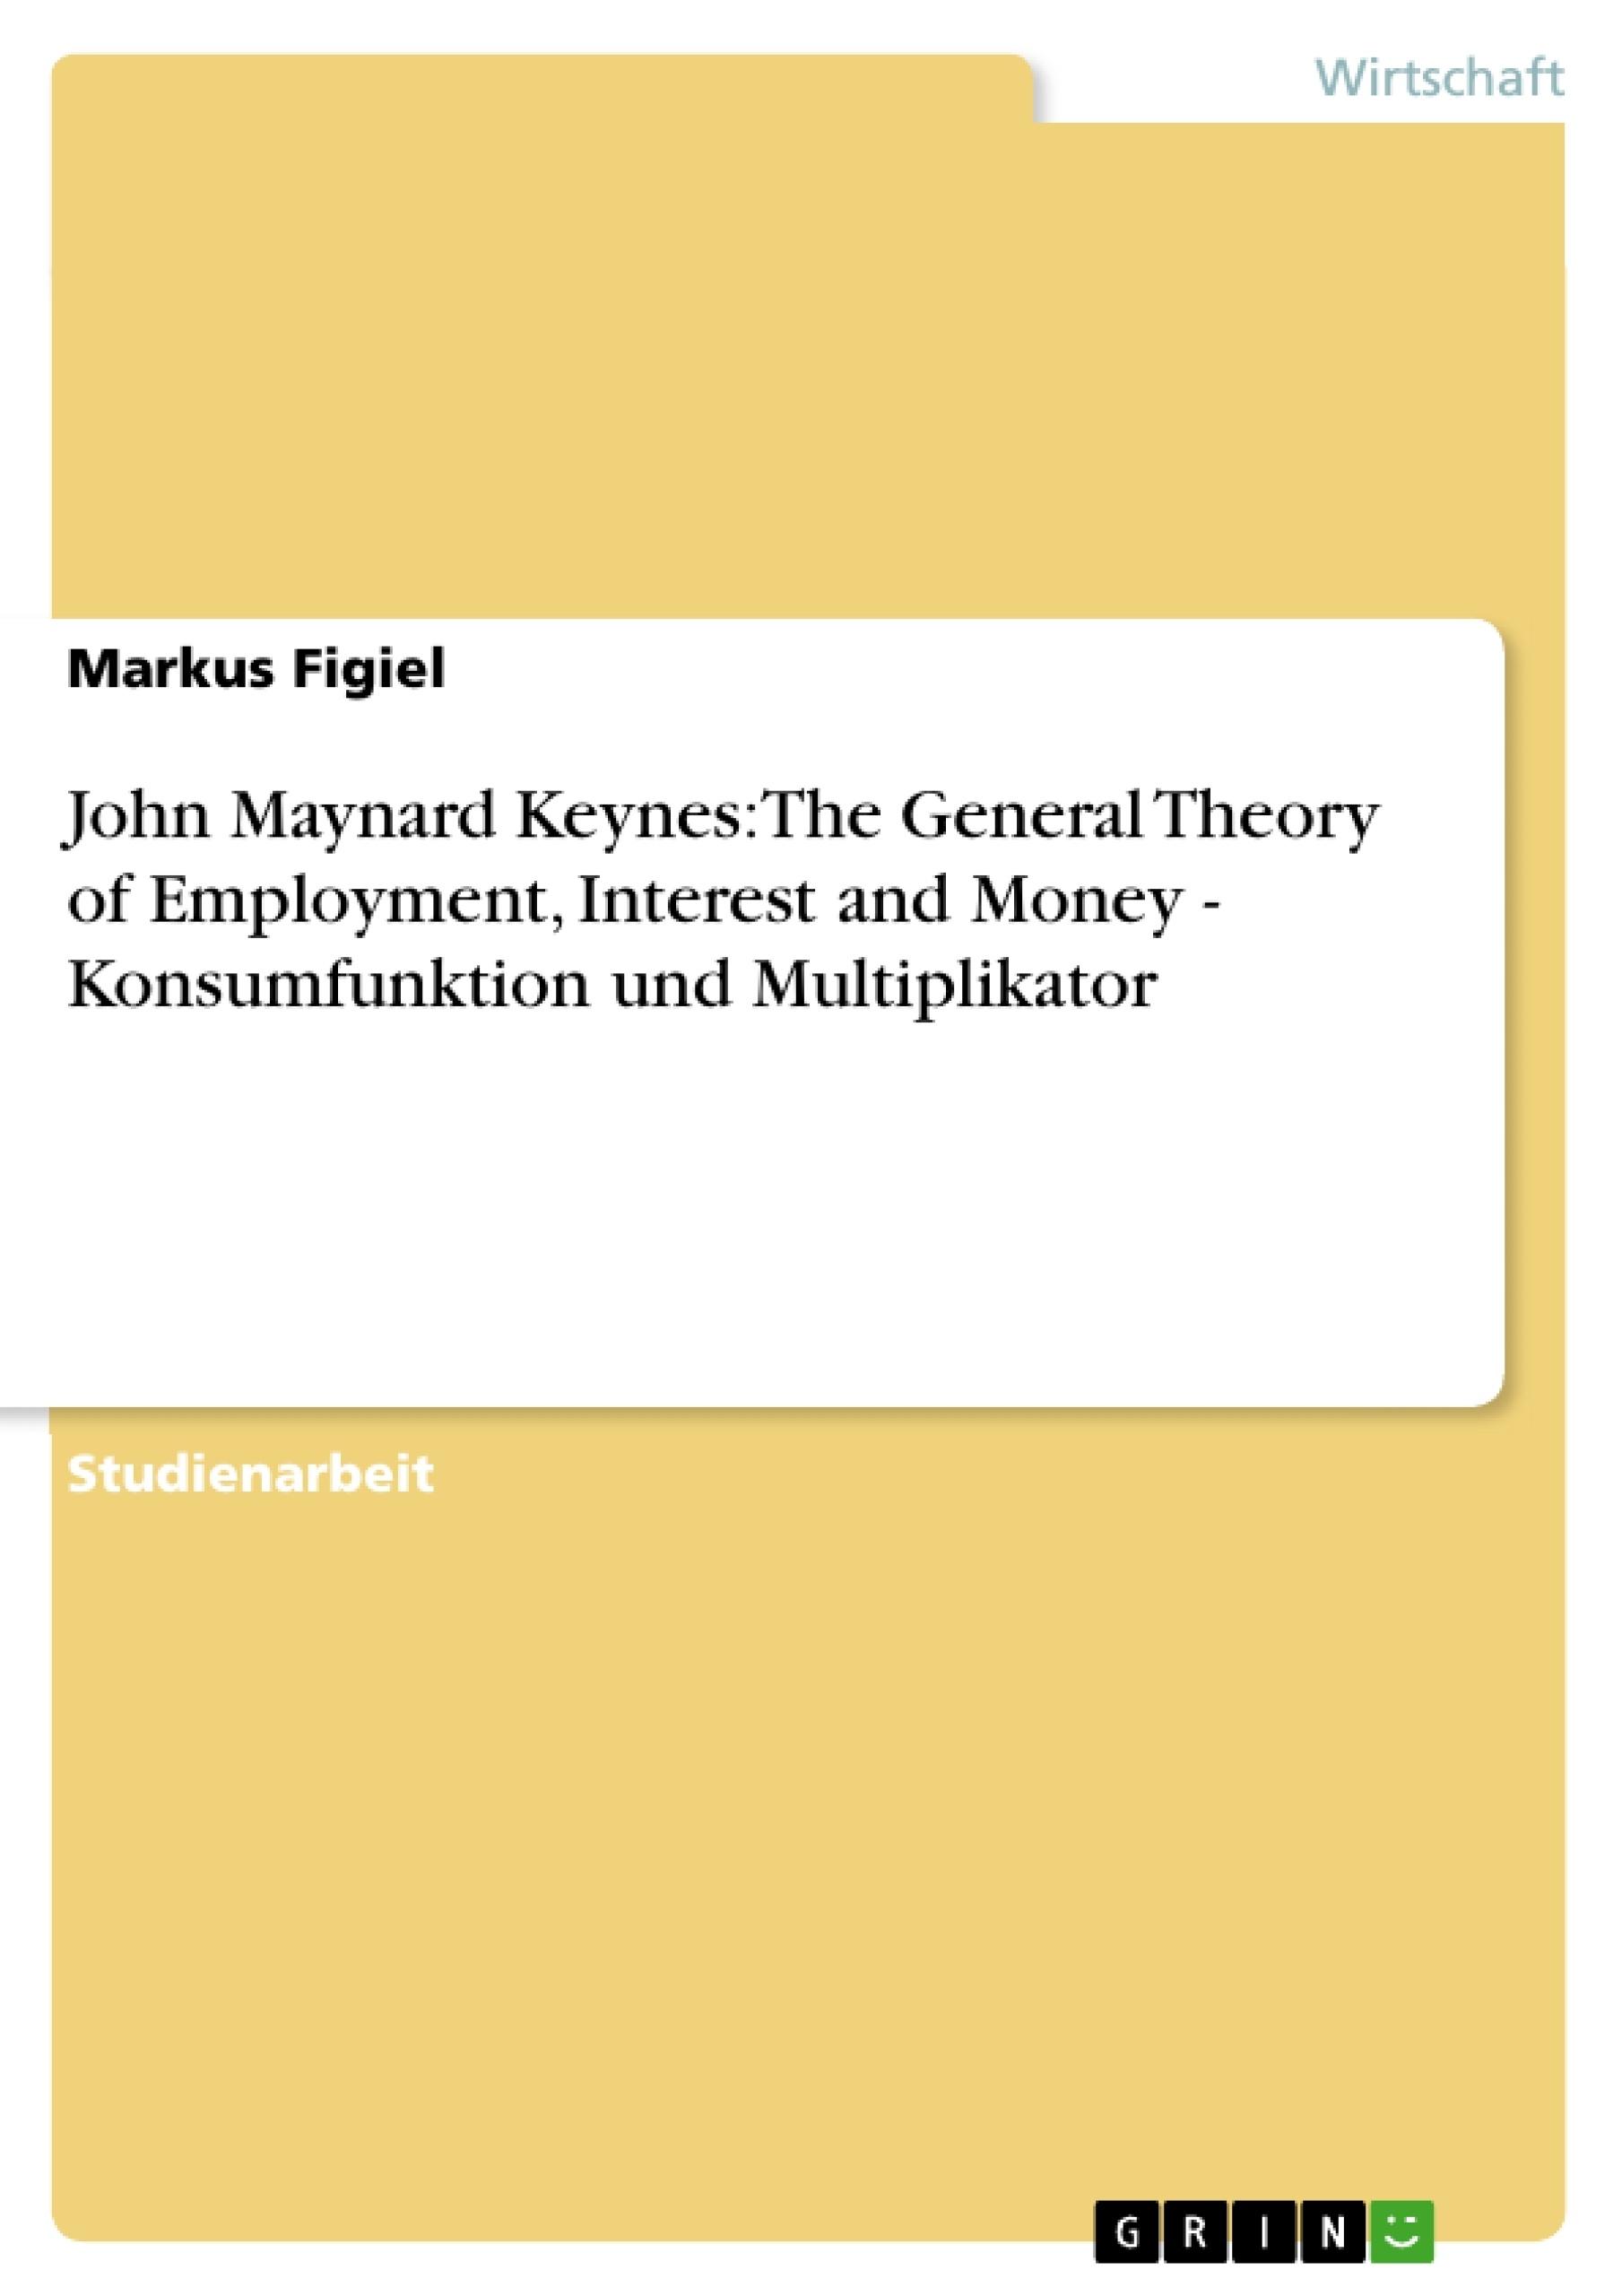 Titel: John Maynard Keynes: The General Theory of Employment, Interest and Money - Konsumfunktion und Multiplikator